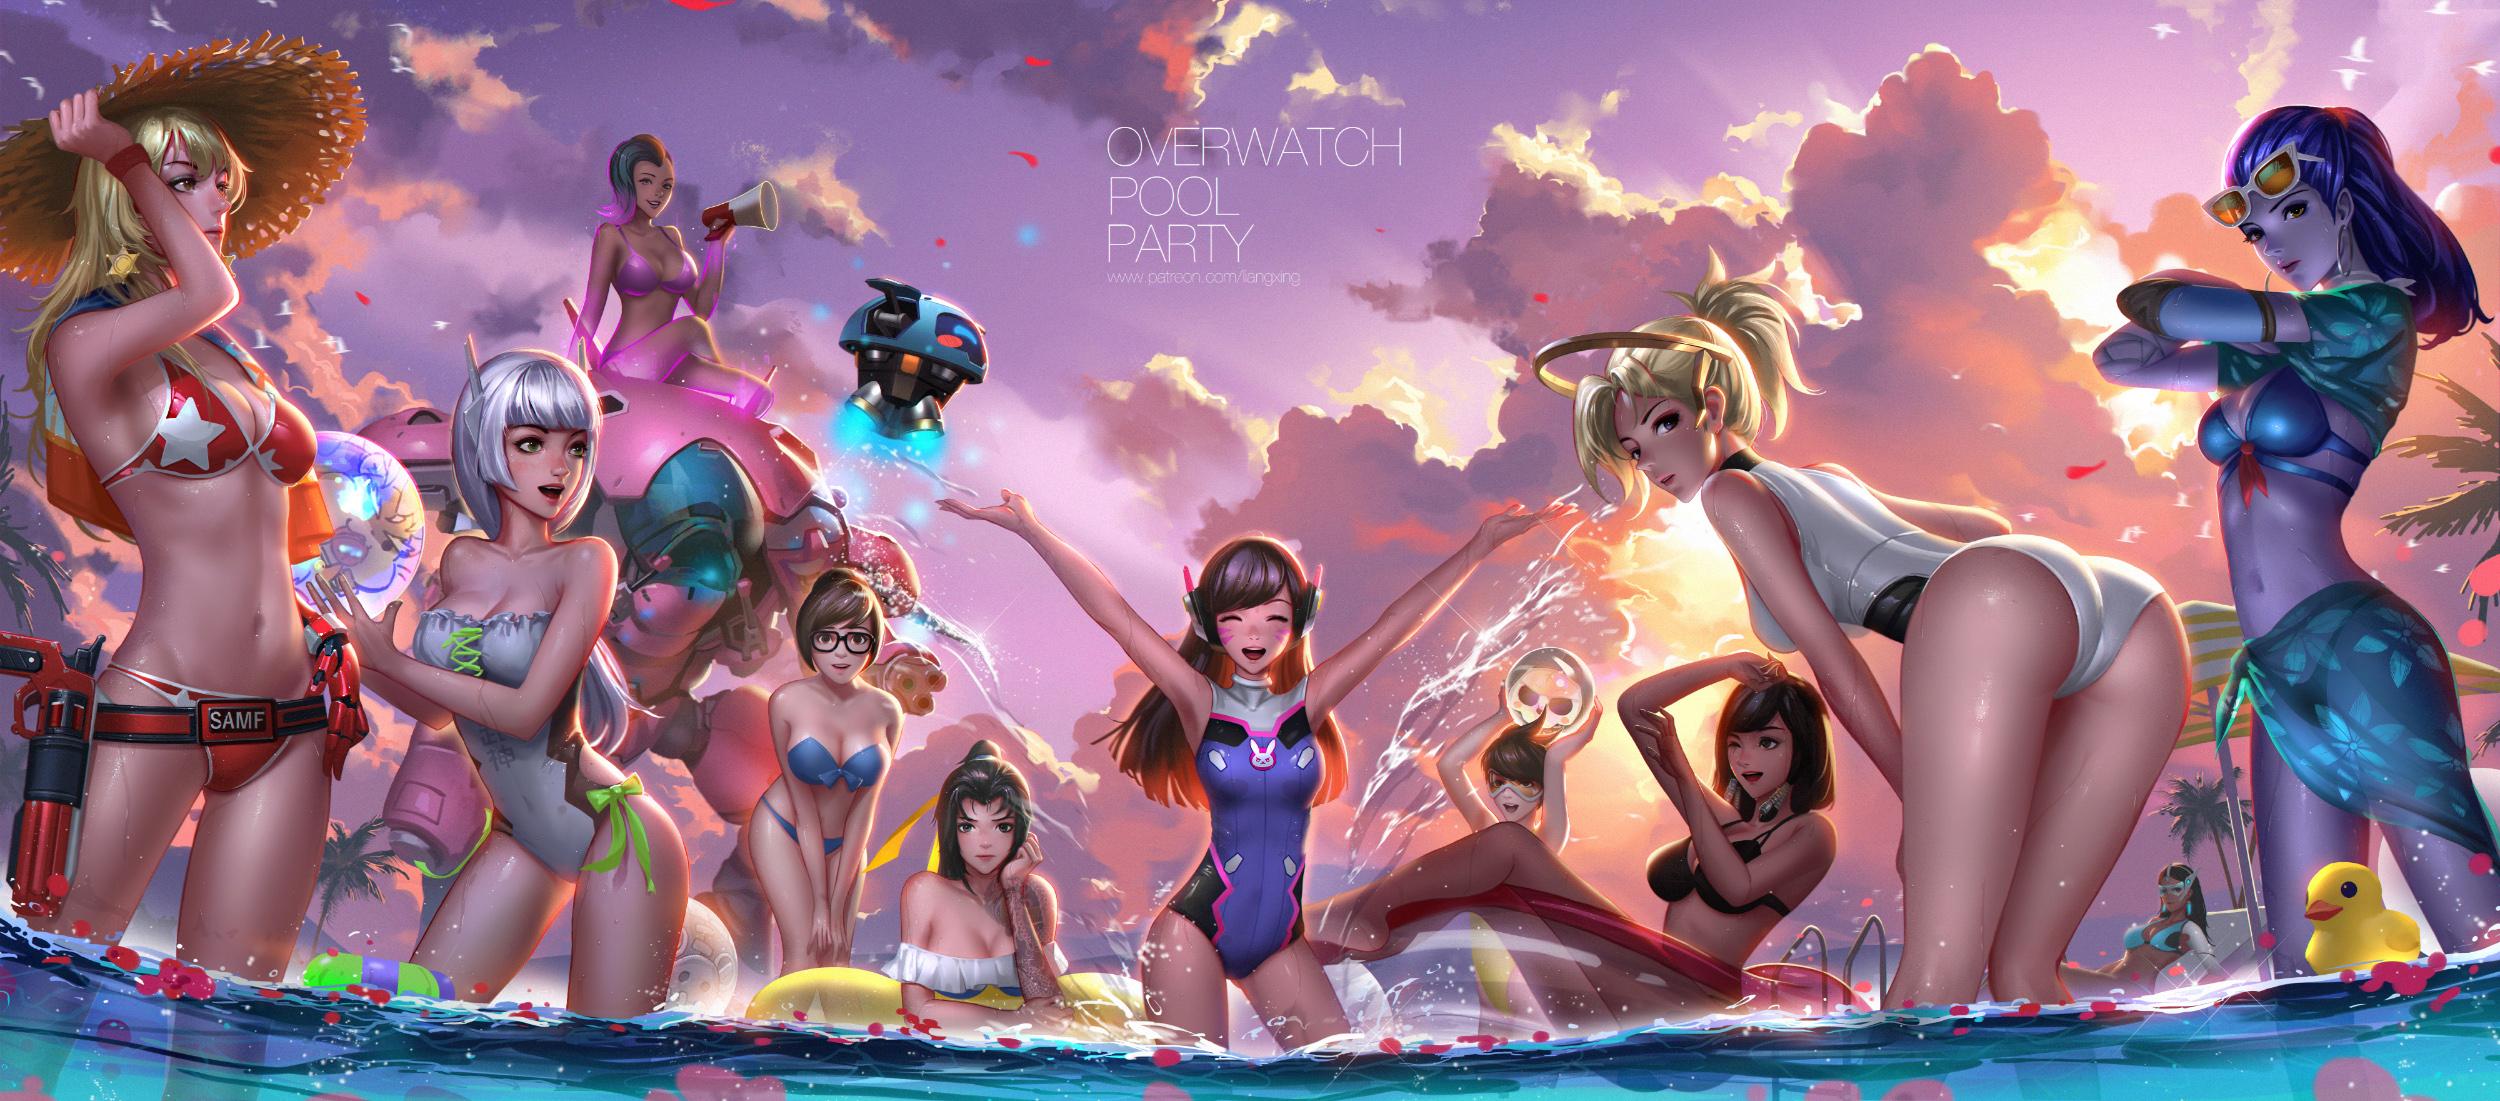 Wallpaper  Overwatch, Video Games, Pool Party, Bikini -2091